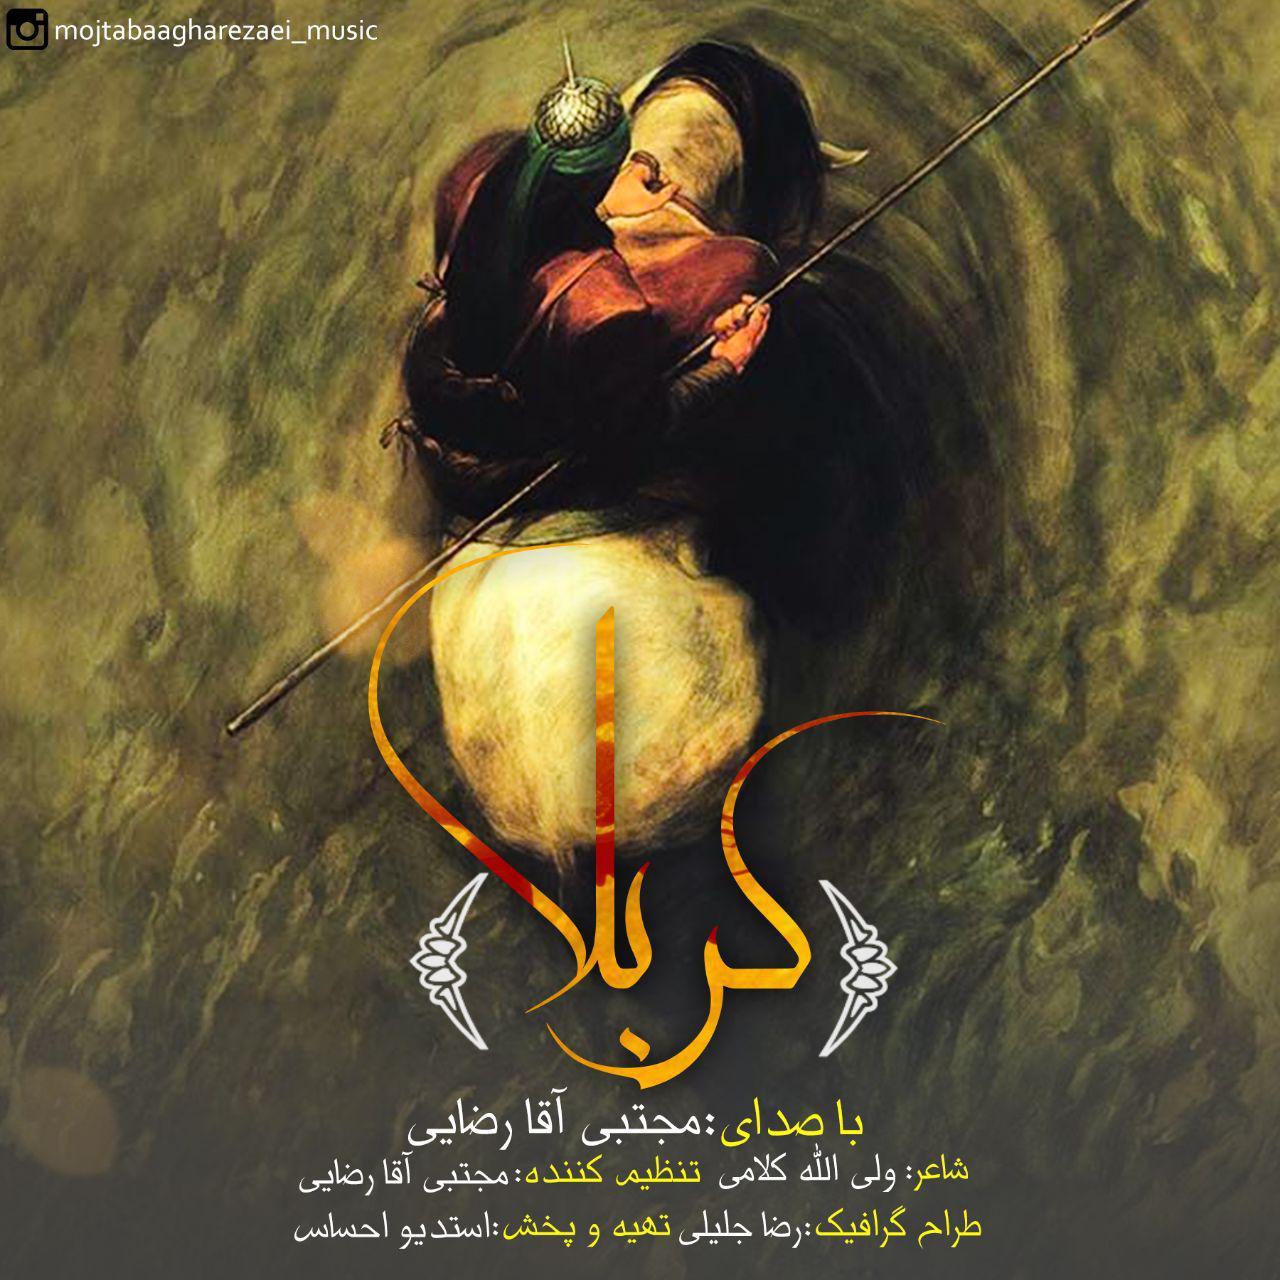 Mojtaba Agharezaei – Karbala